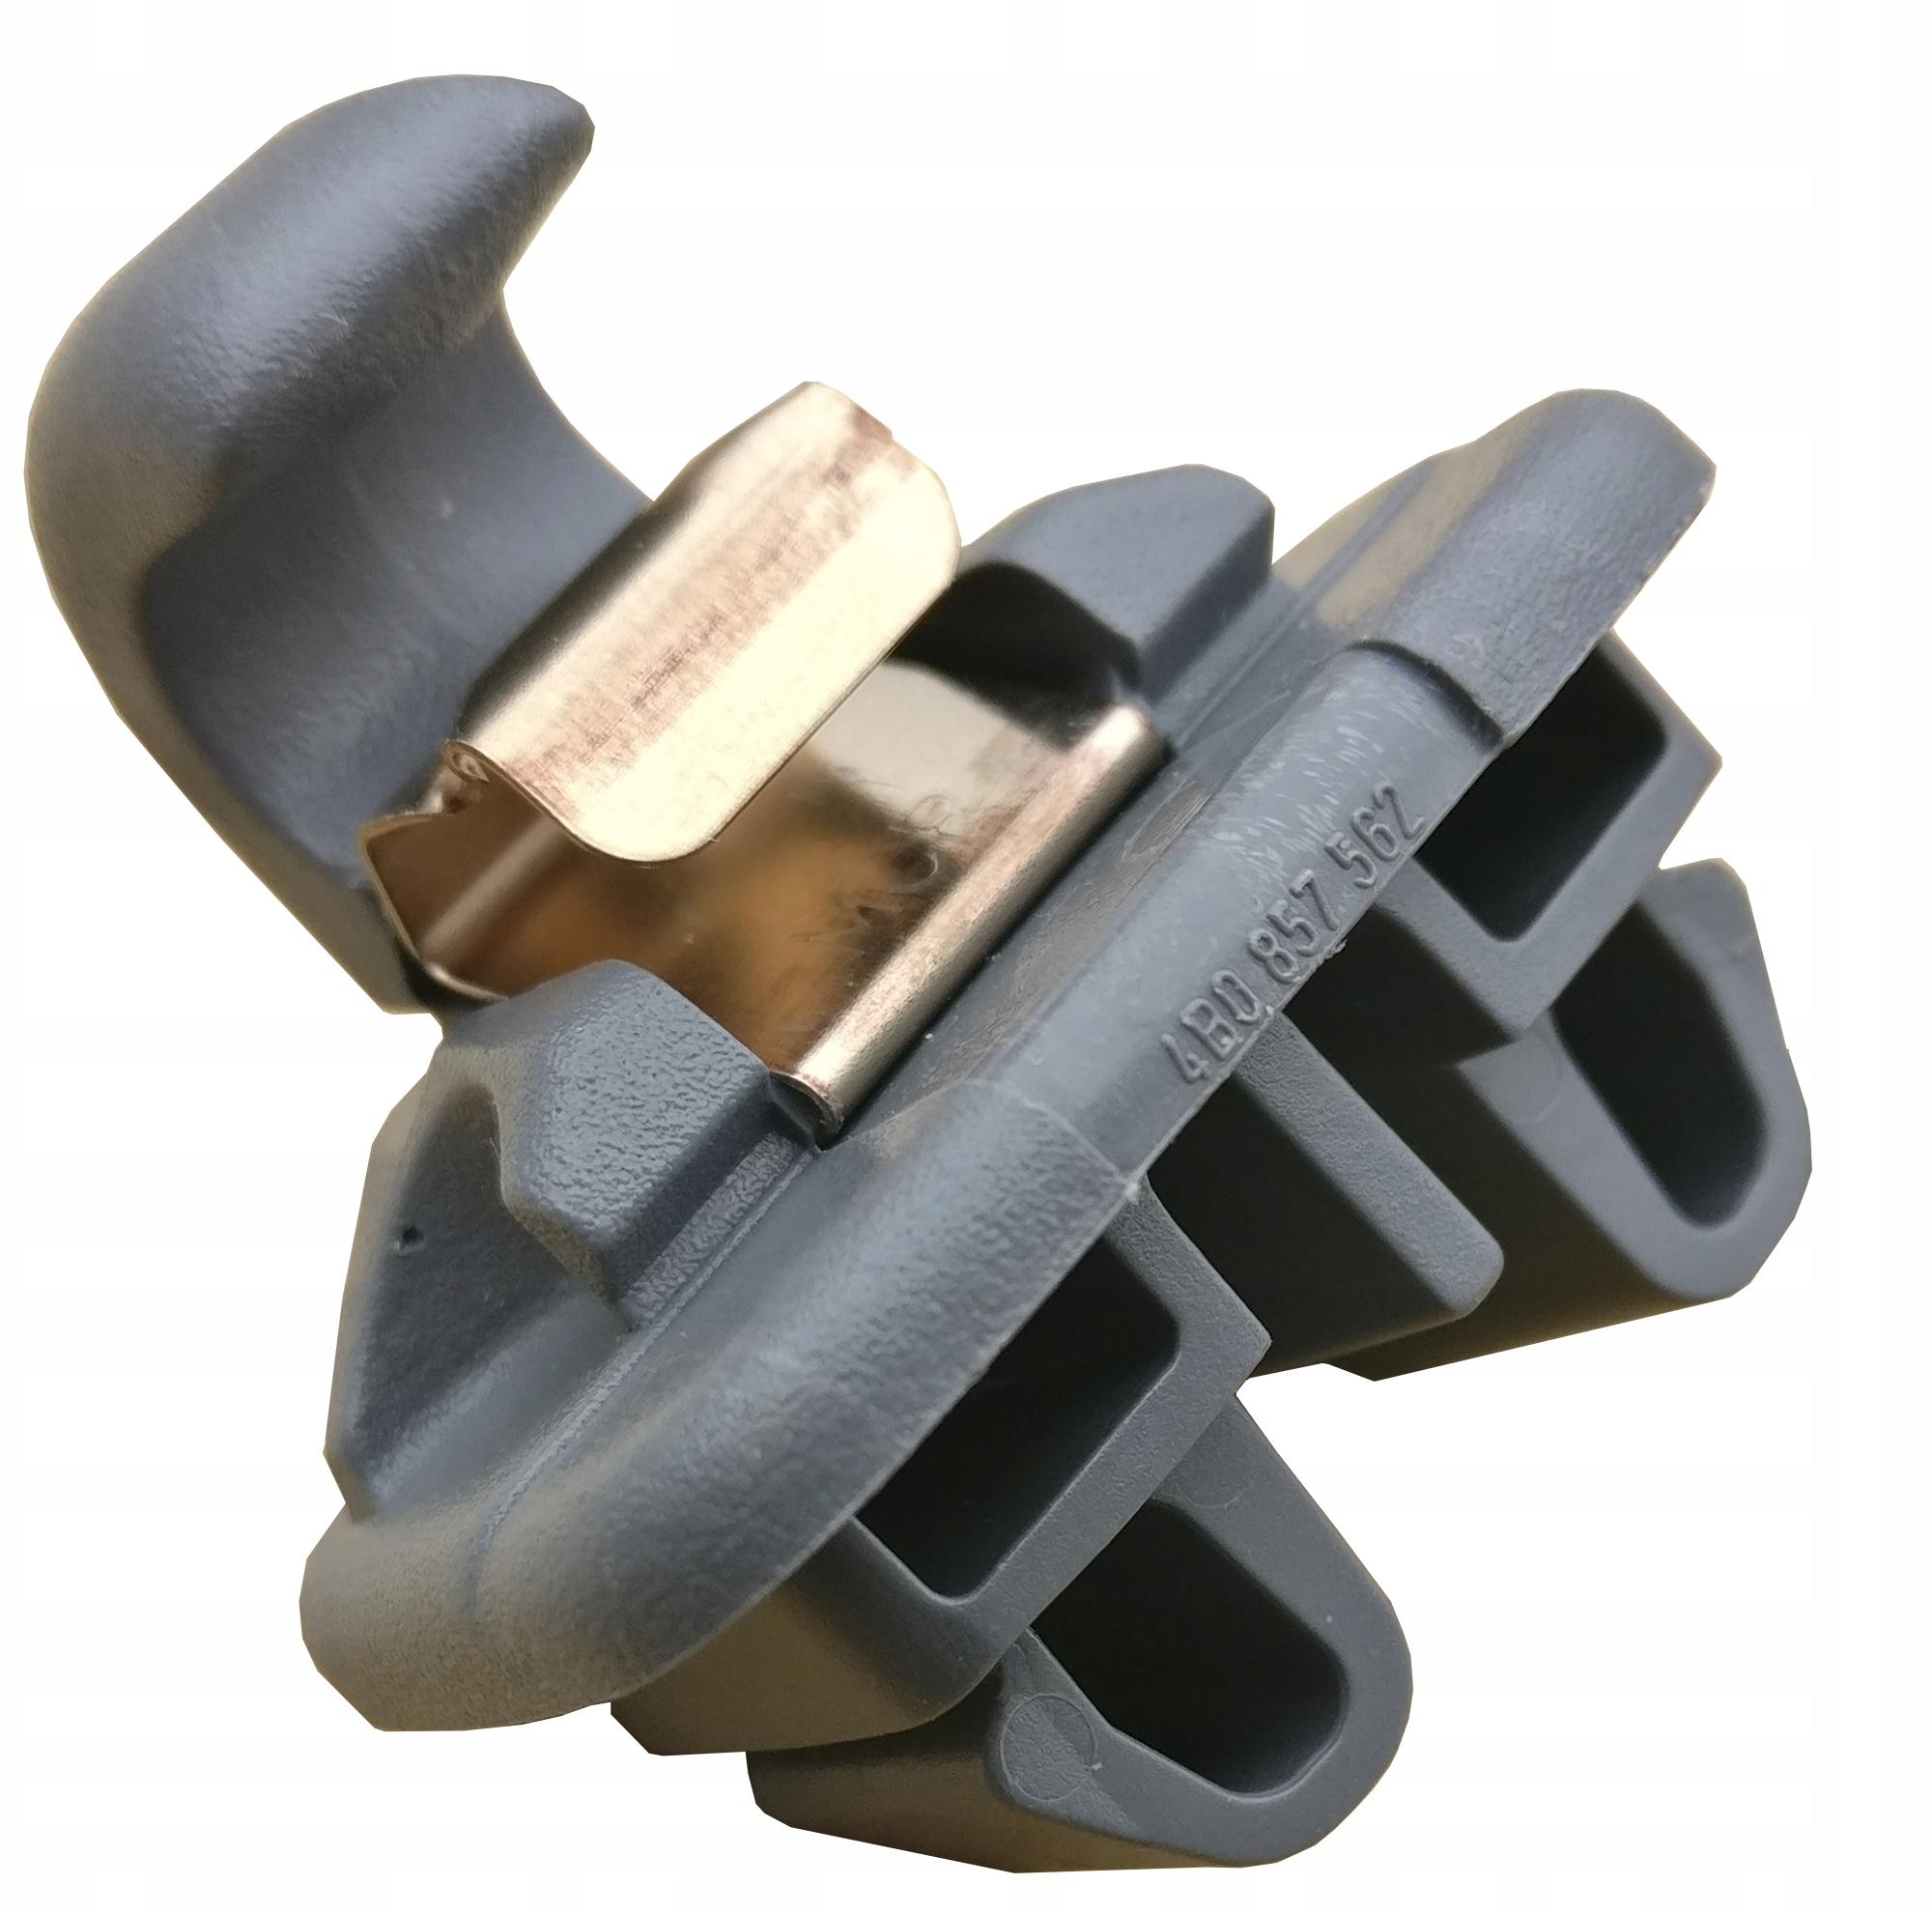 держатель крючок крючок подсолнечника audi a6 c5 tt s6 rs6